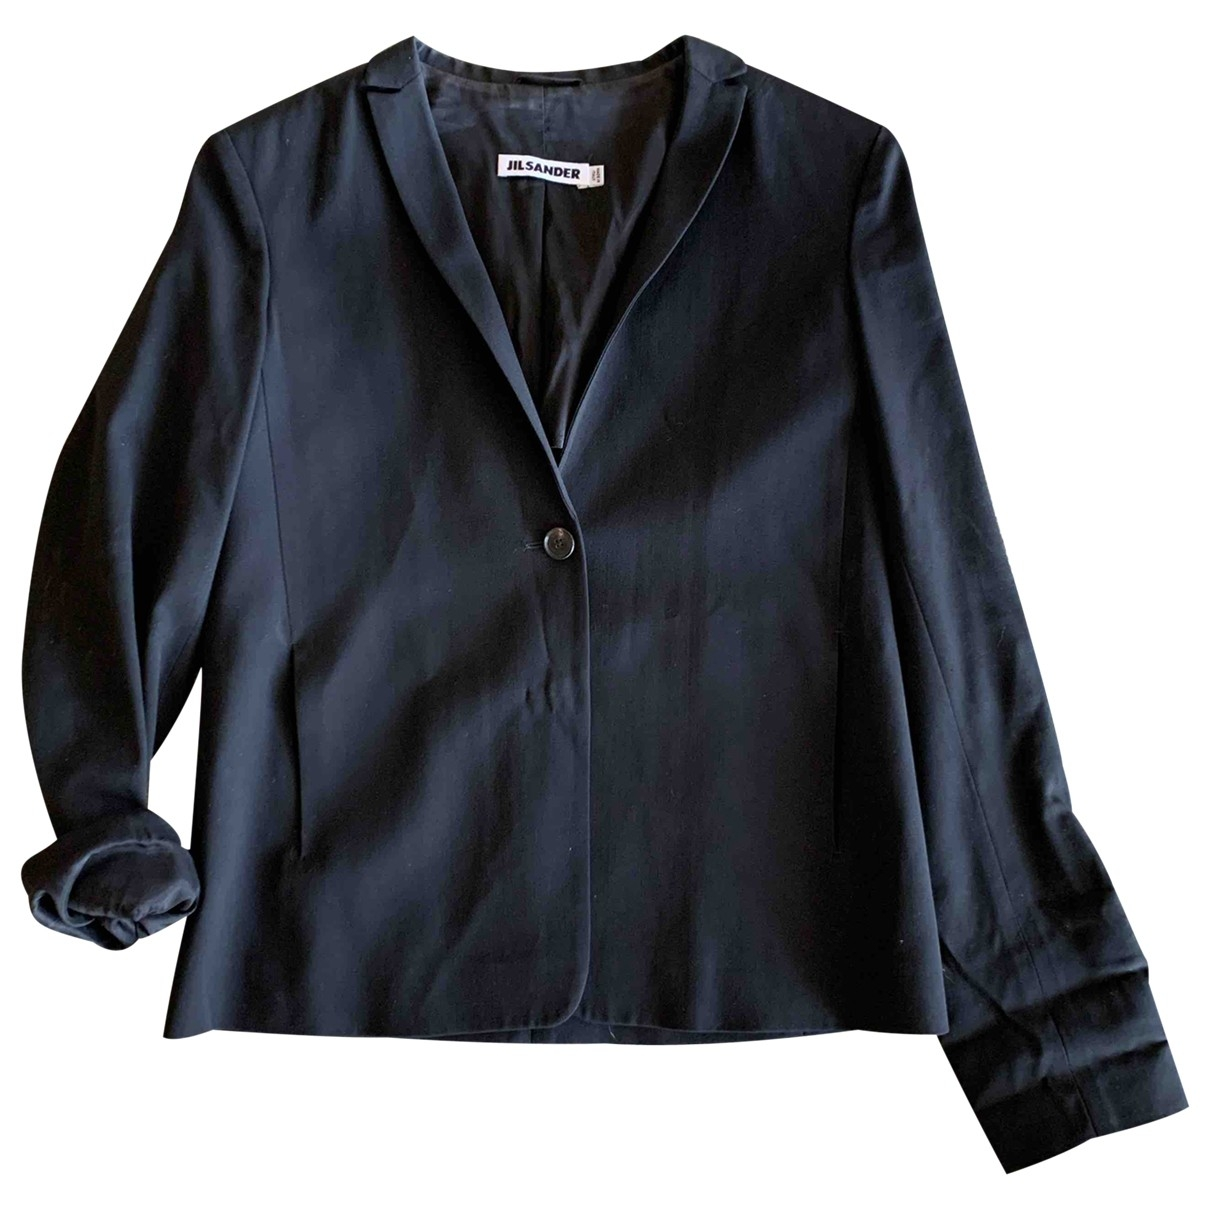 Jil Sander \N Black Wool jacket for Women 34 FR